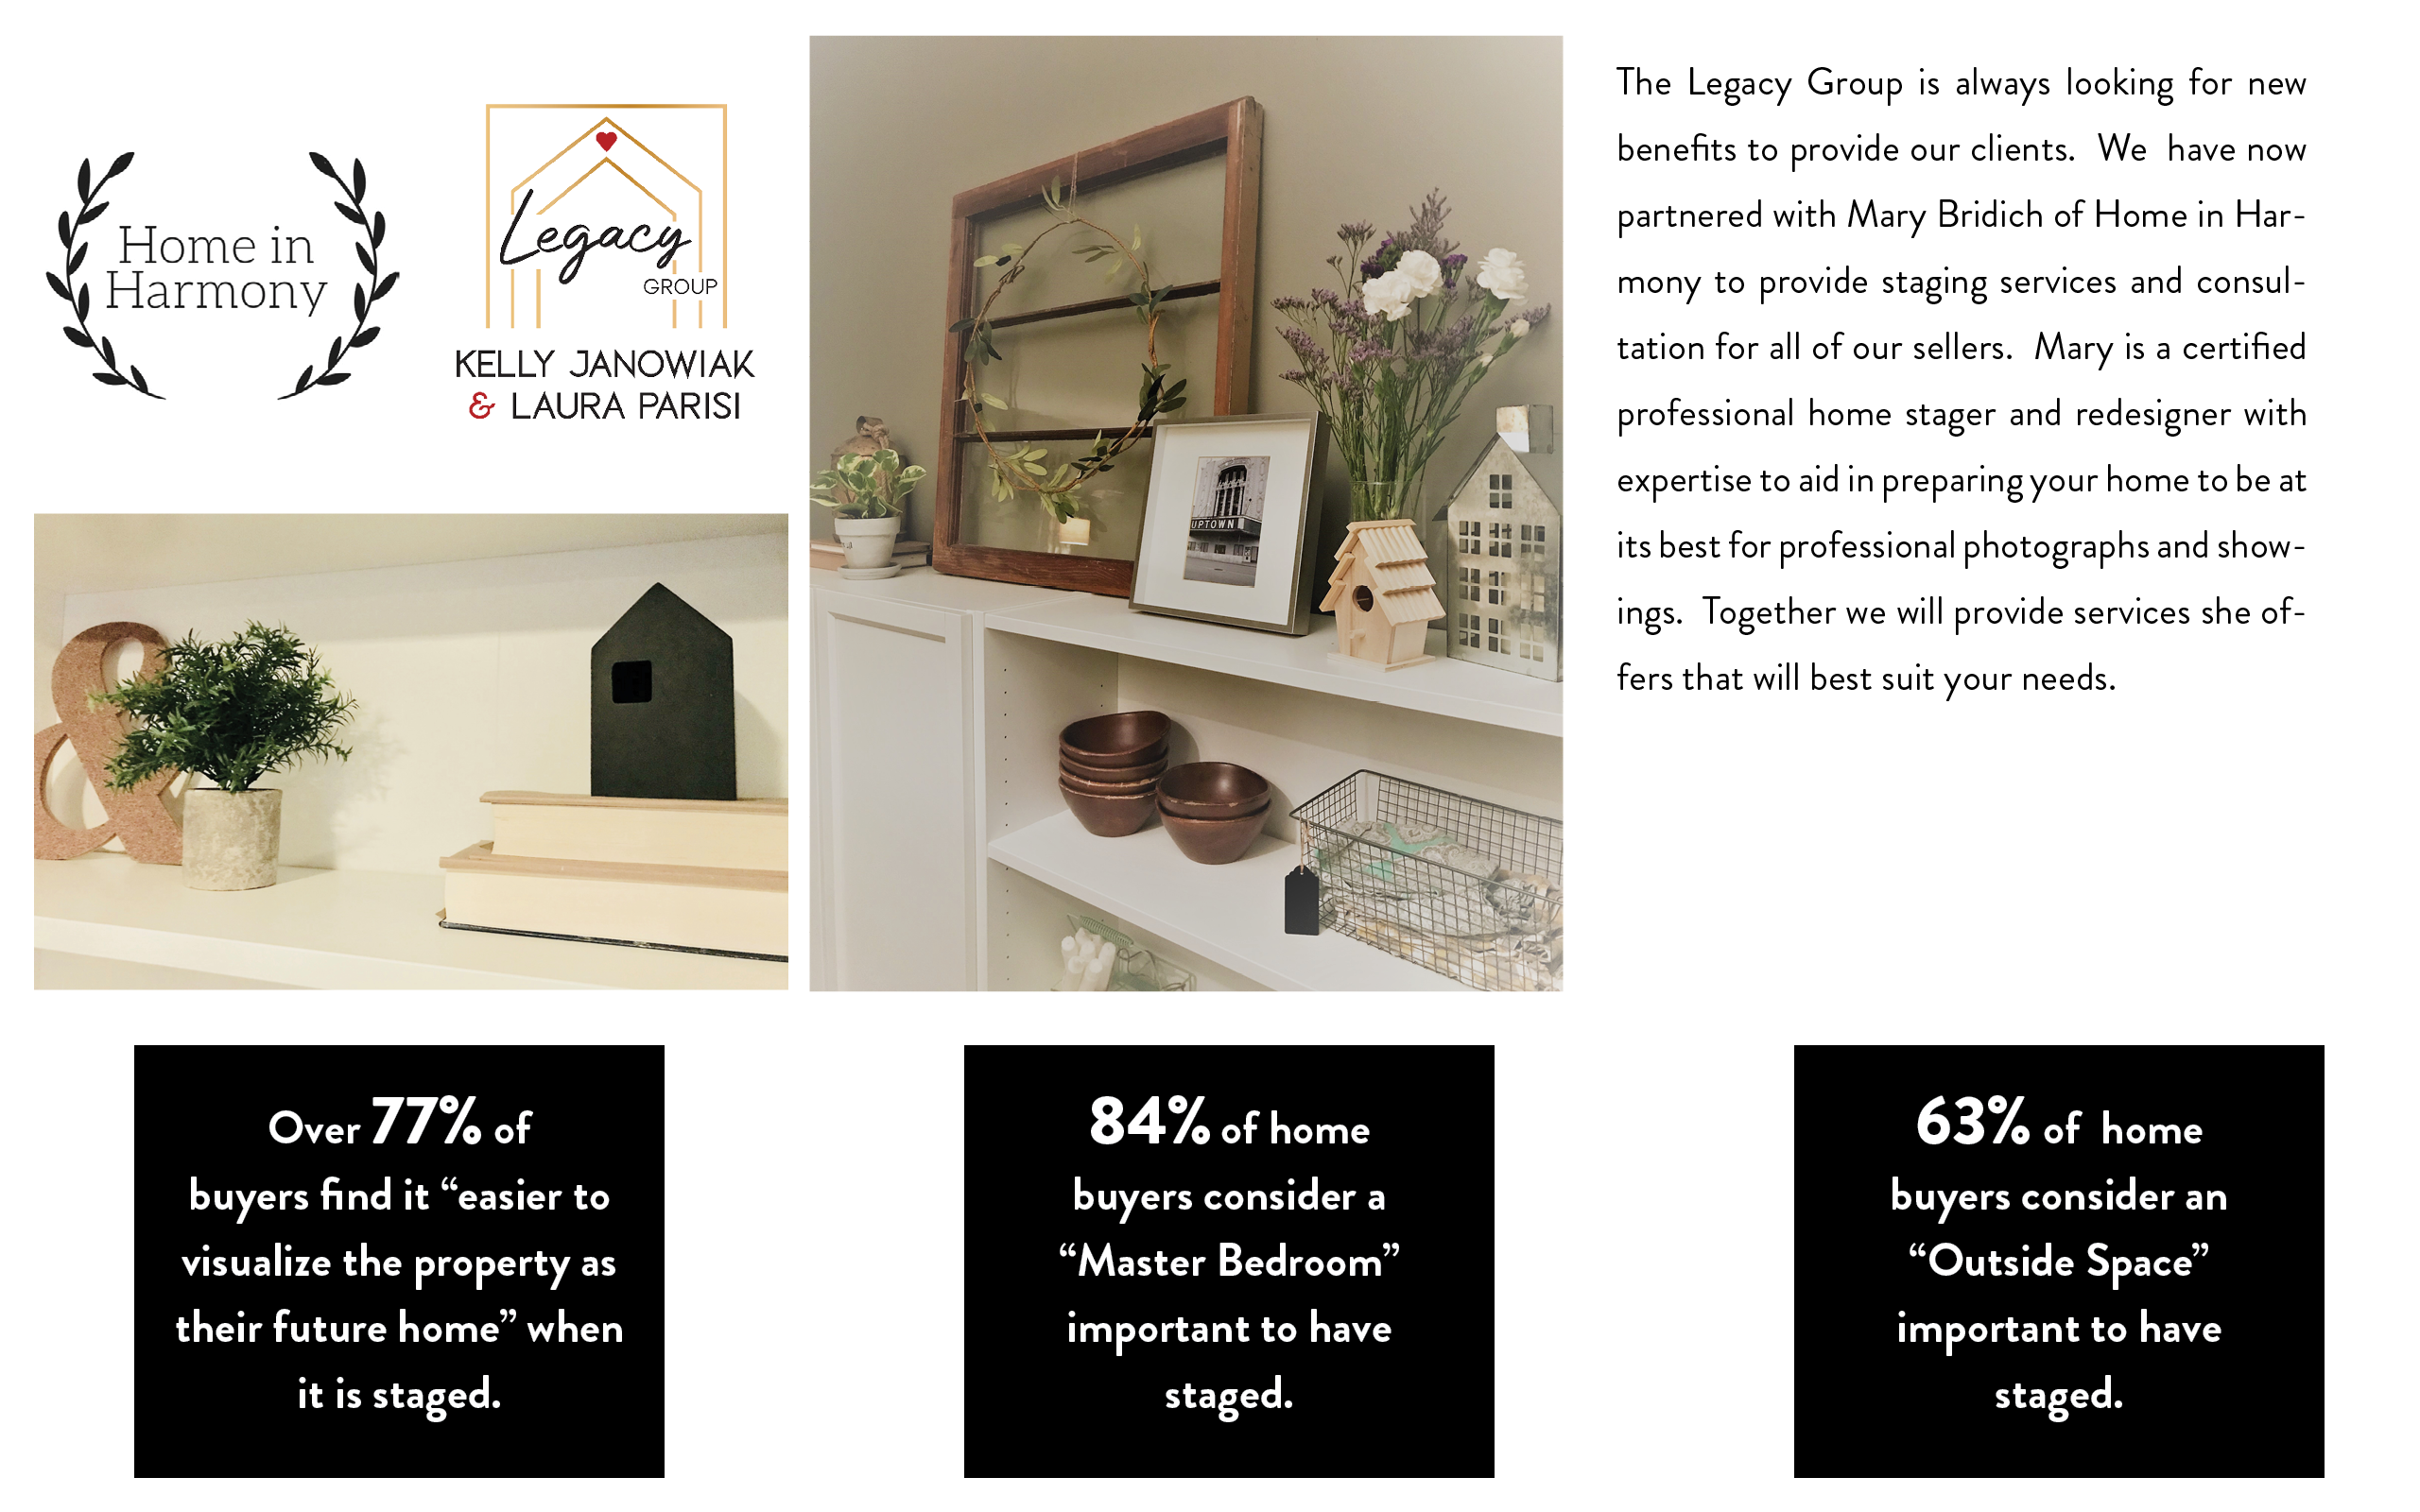 stagingPage_Legacy_Groupv2